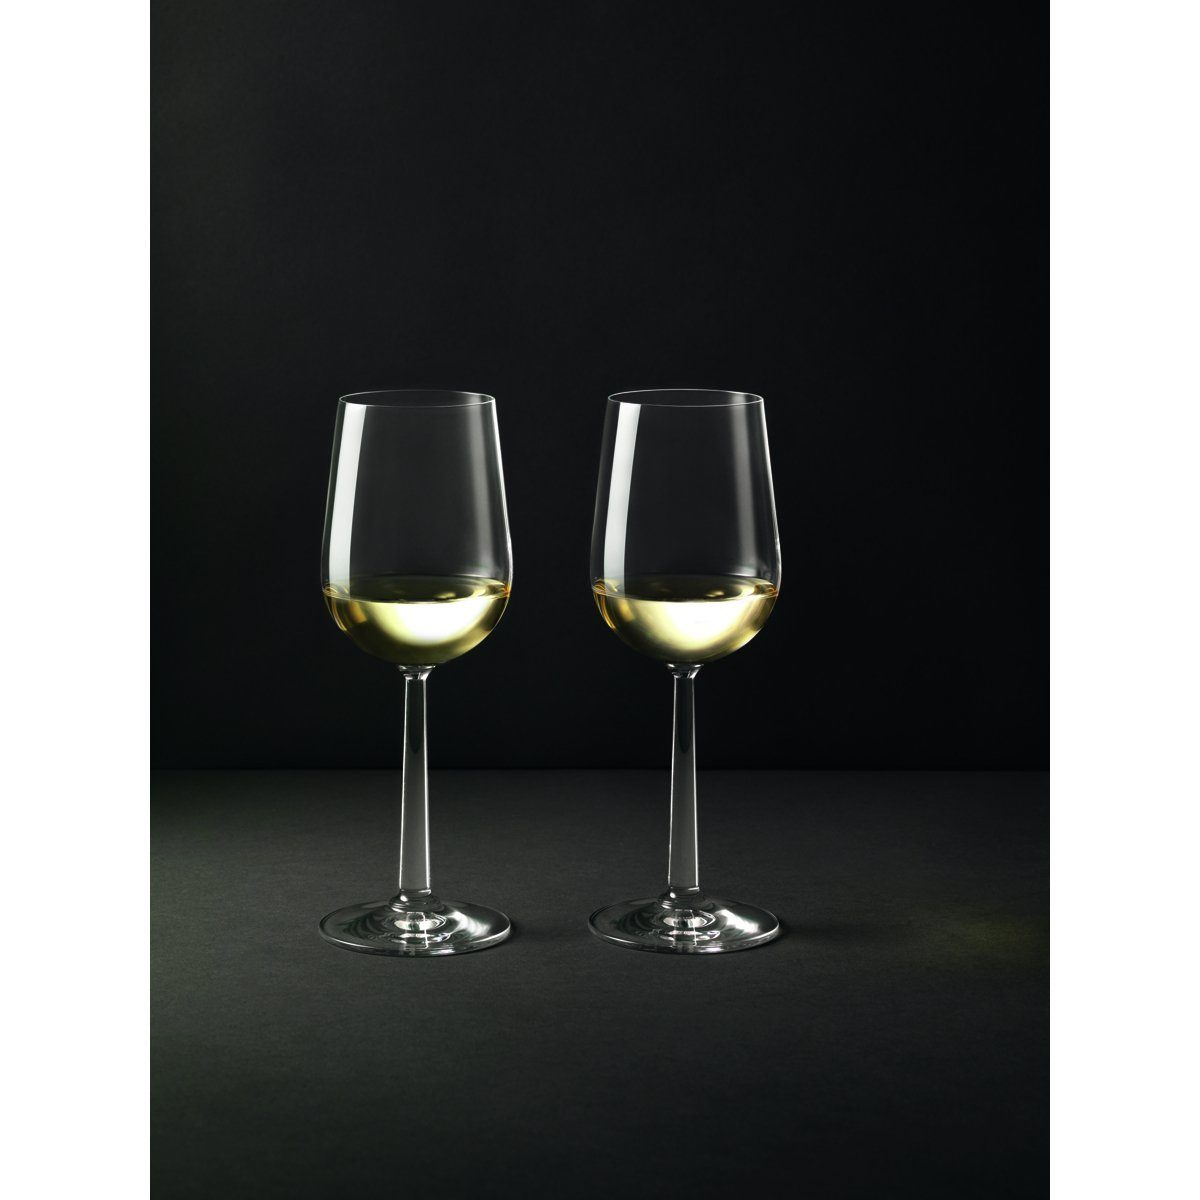 Rosendahl ROSENDAHL Grand Cru Bordeaux Weissweinglas 2er Set